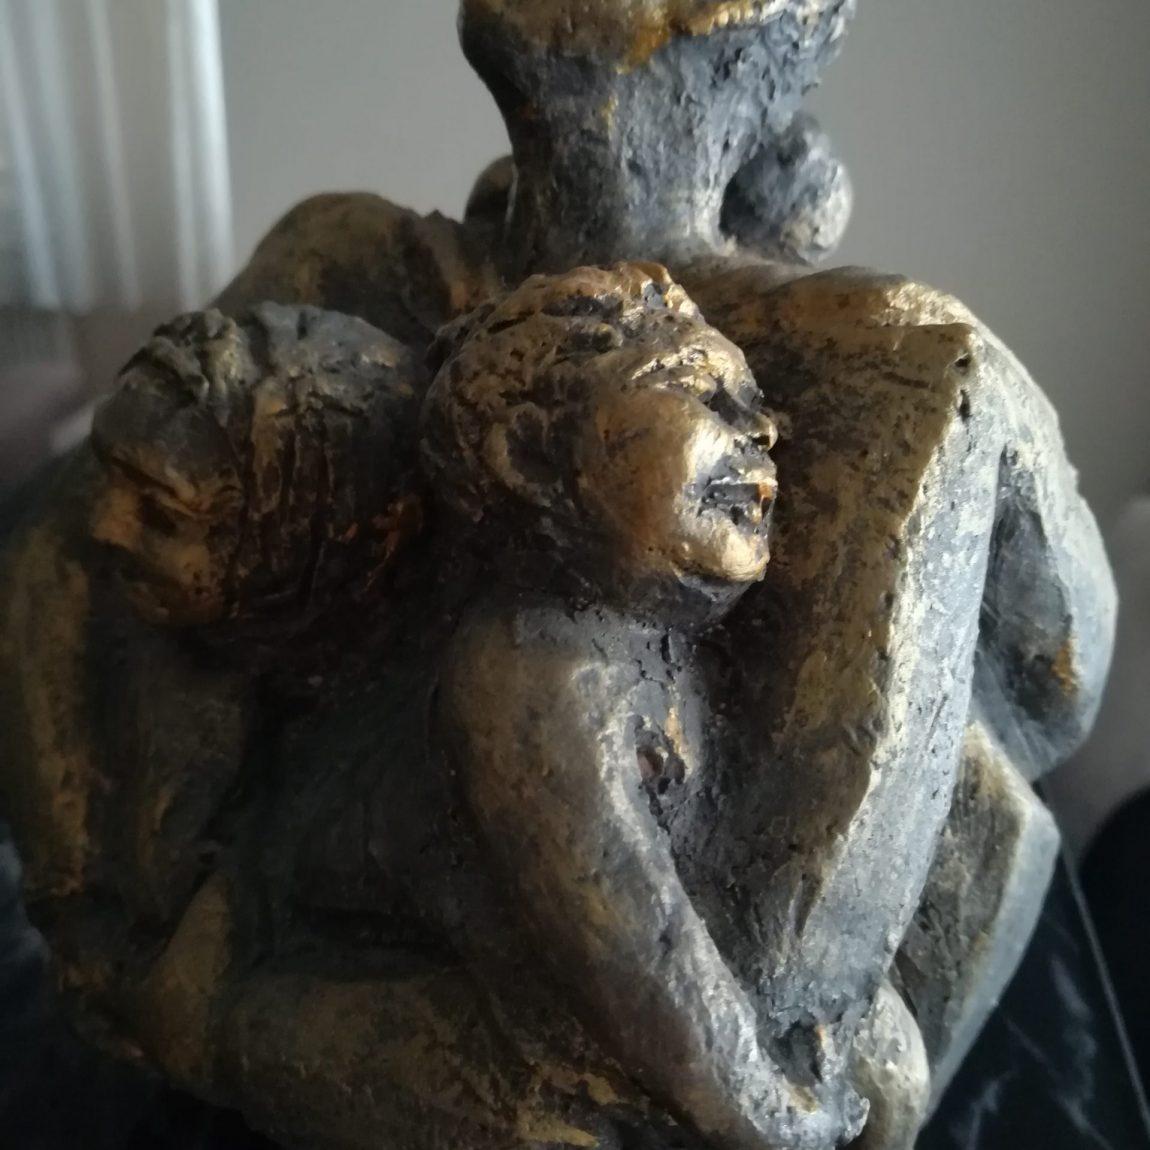 Gülseren Dalbudak Ana  Teknik: Pişmiş topraktan heykel Boyut:20x.20x20cm. Fiyat:1.180 TL.